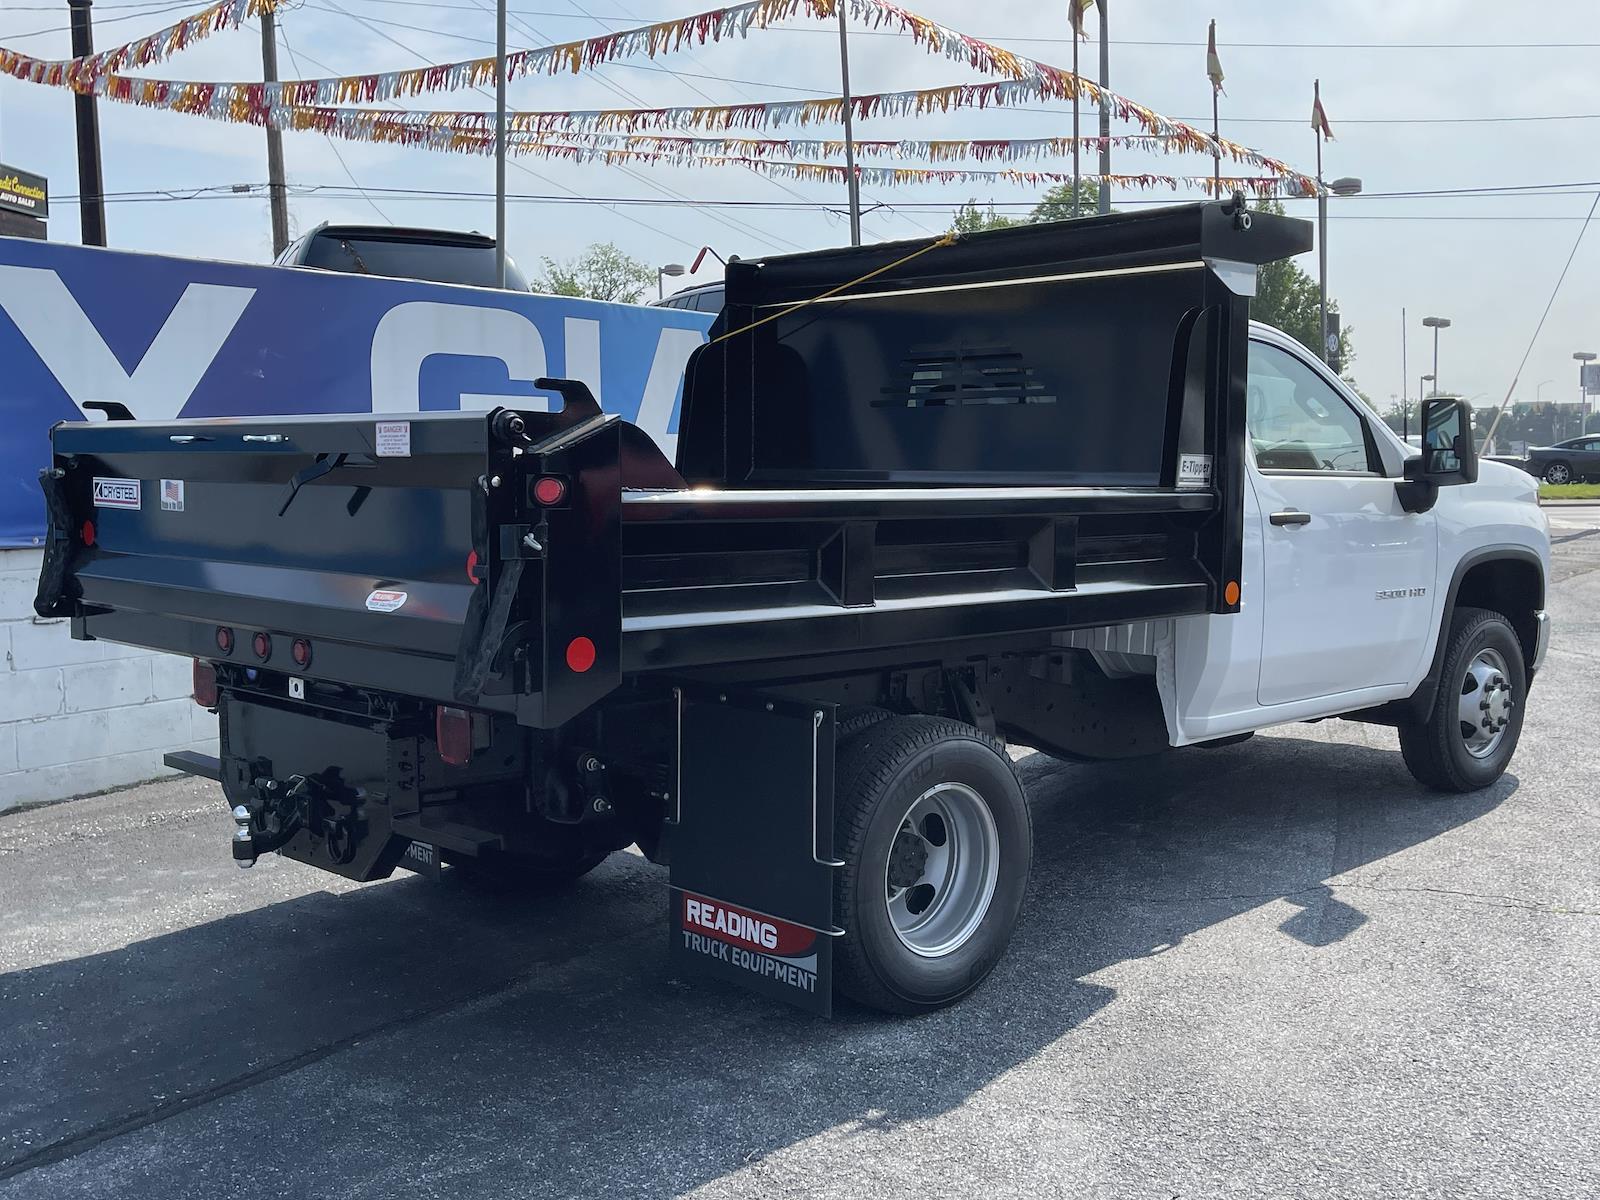 2021 Chevrolet Silverado 3500 Regular Cab 4x4, Crysteel Dump Body #215667 - photo 1